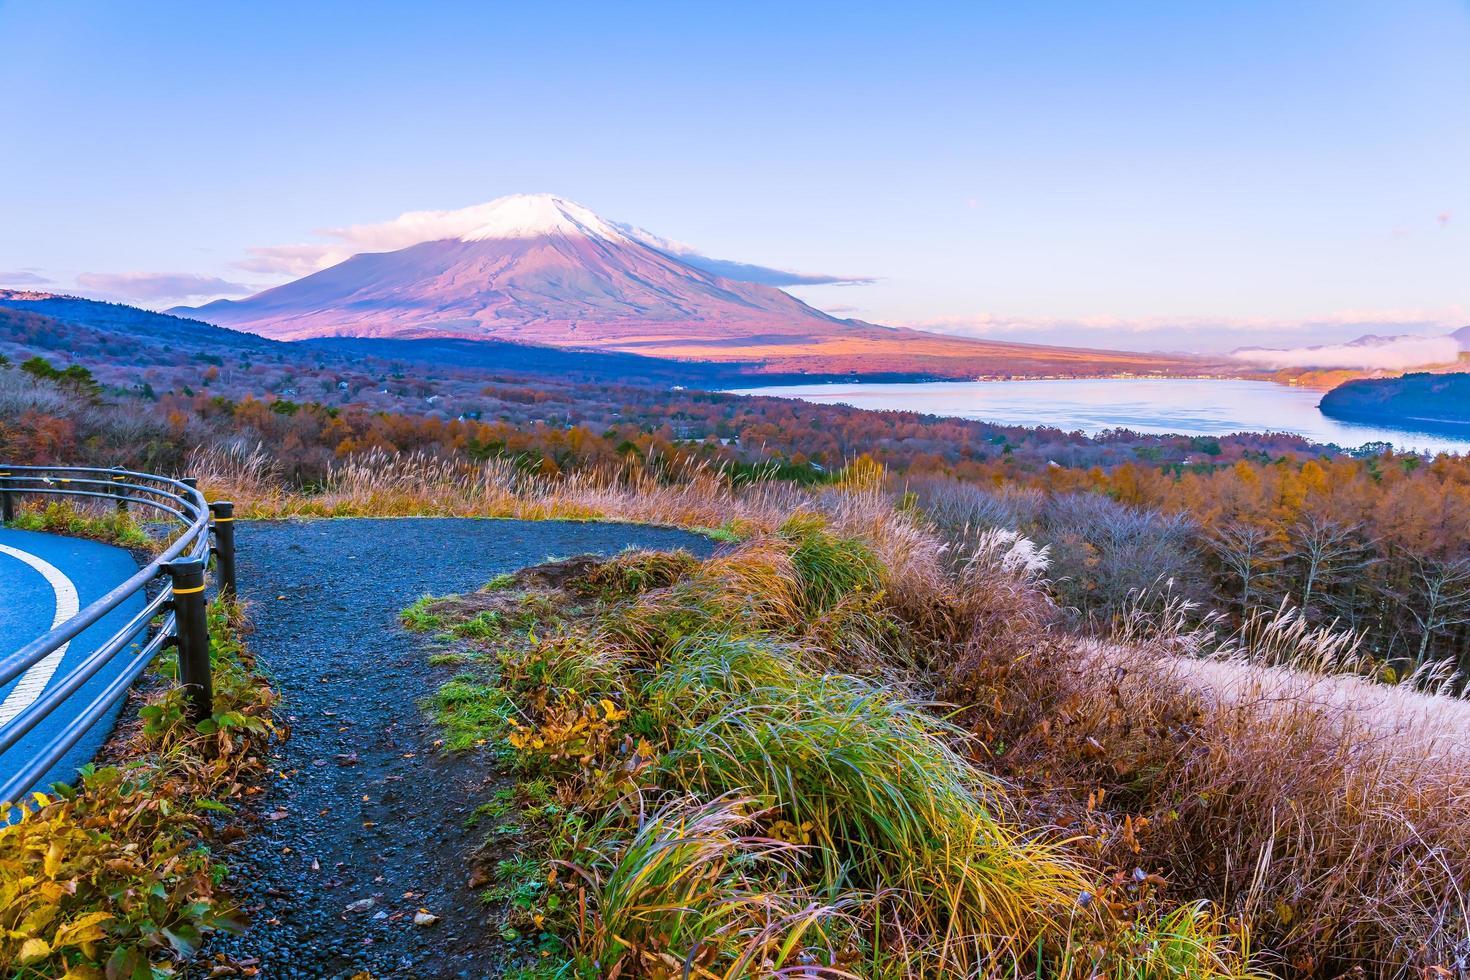 Beautiful view of Mt. Fuji at Lake Yamanakako, Japan photo